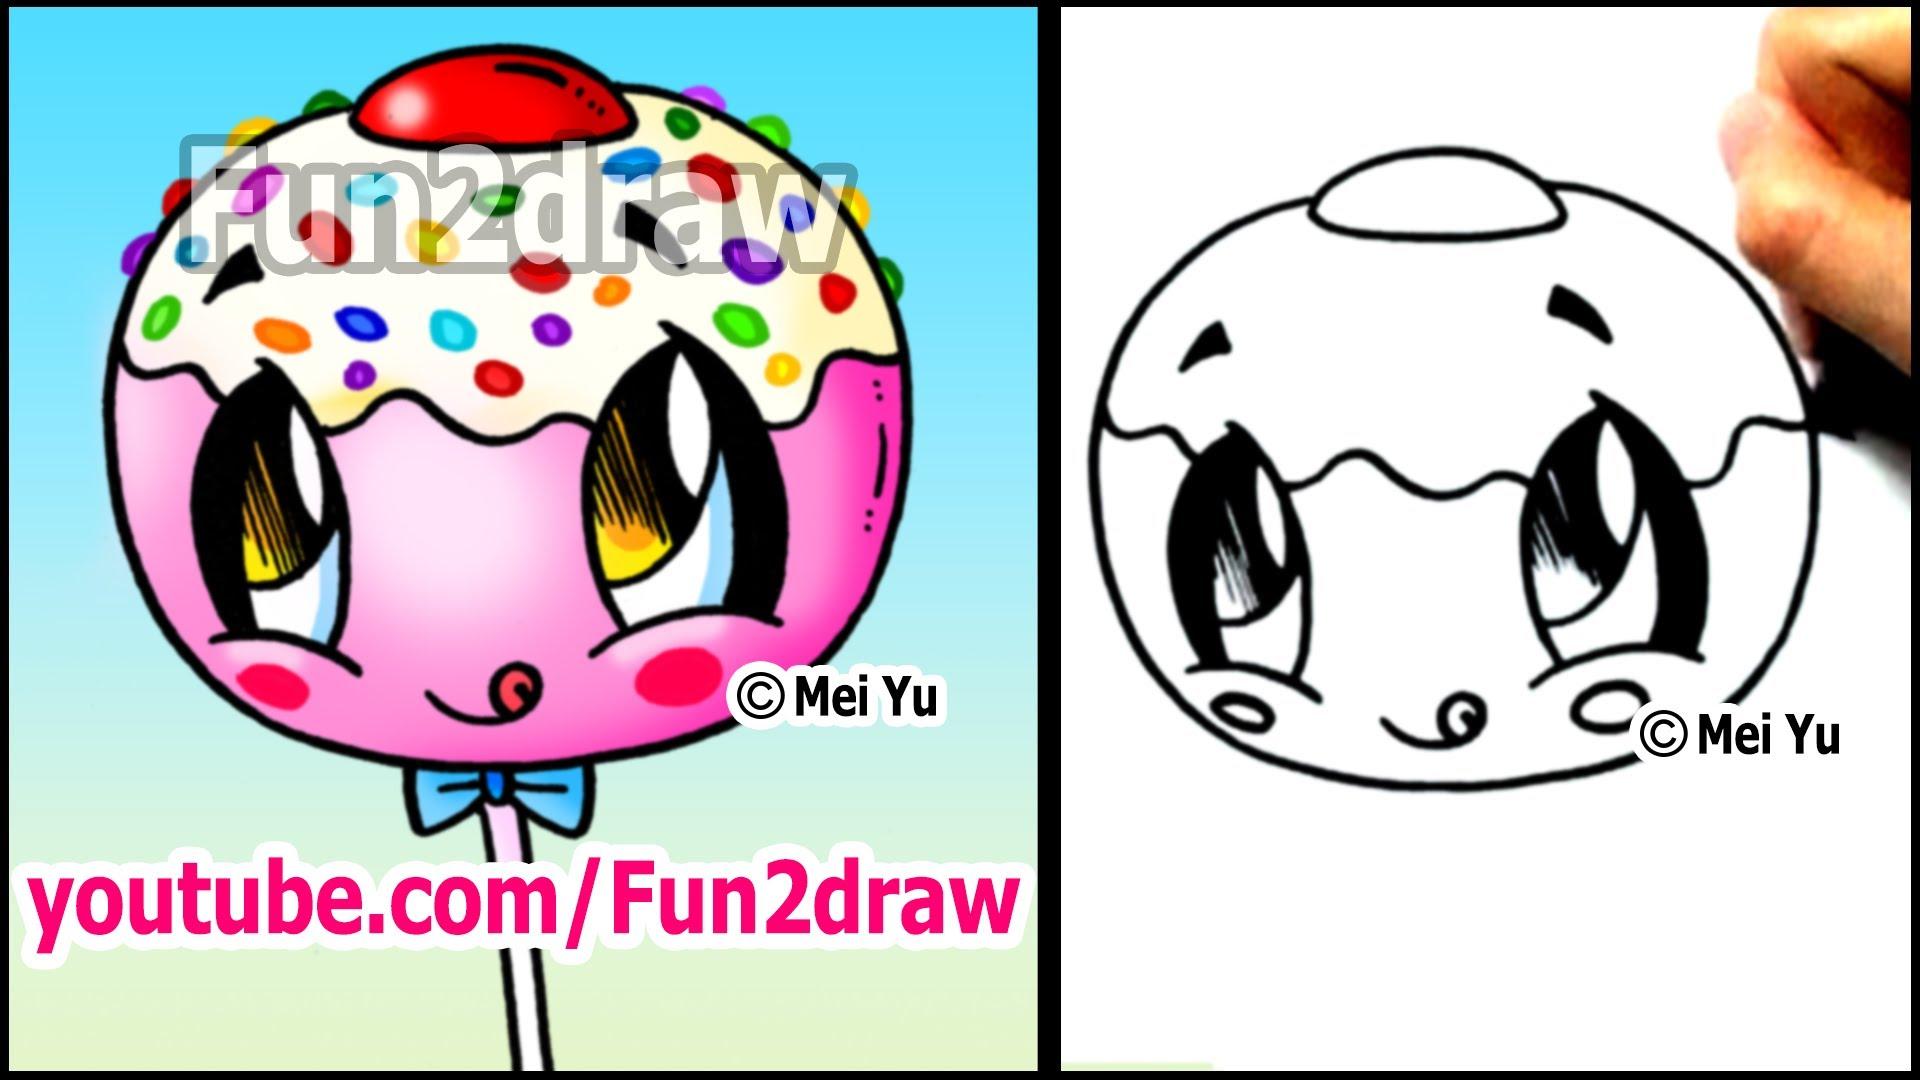 Drawn strawberry fun2draw (and Pop Cute Cute Cake